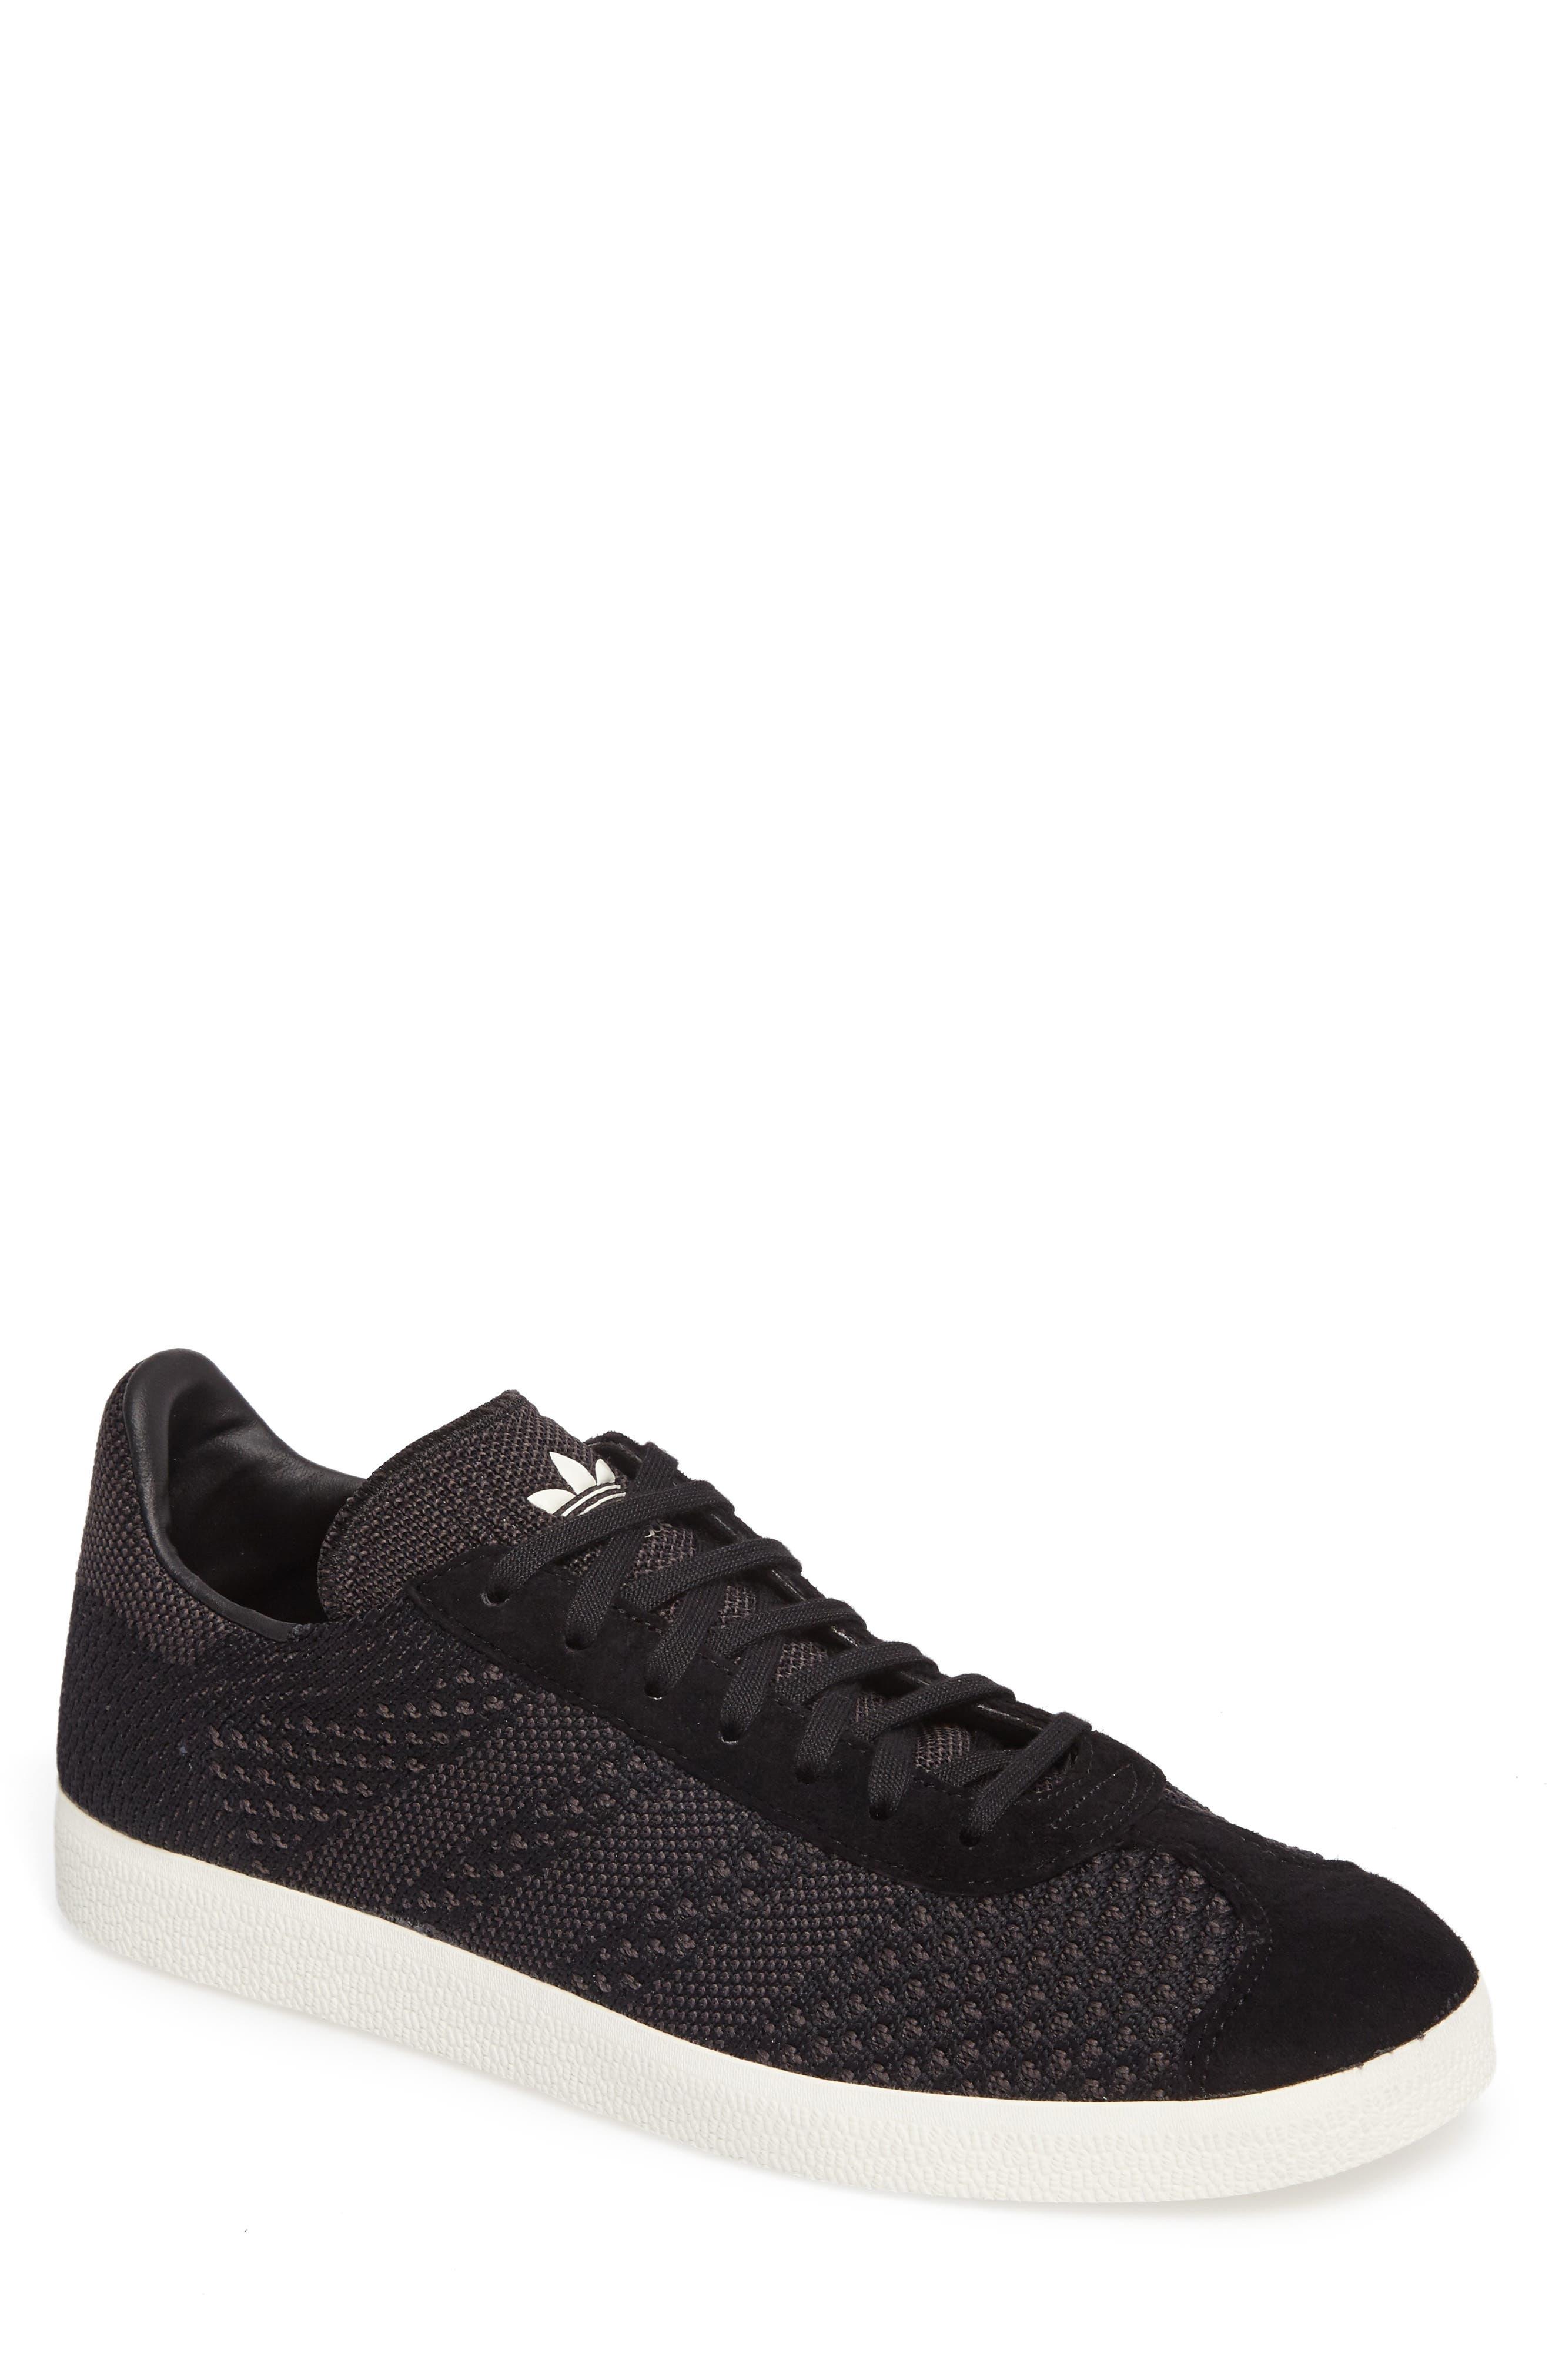 Gazelle Primeknit Sneaker,                             Main thumbnail 1, color,                             Core Black/ Off White